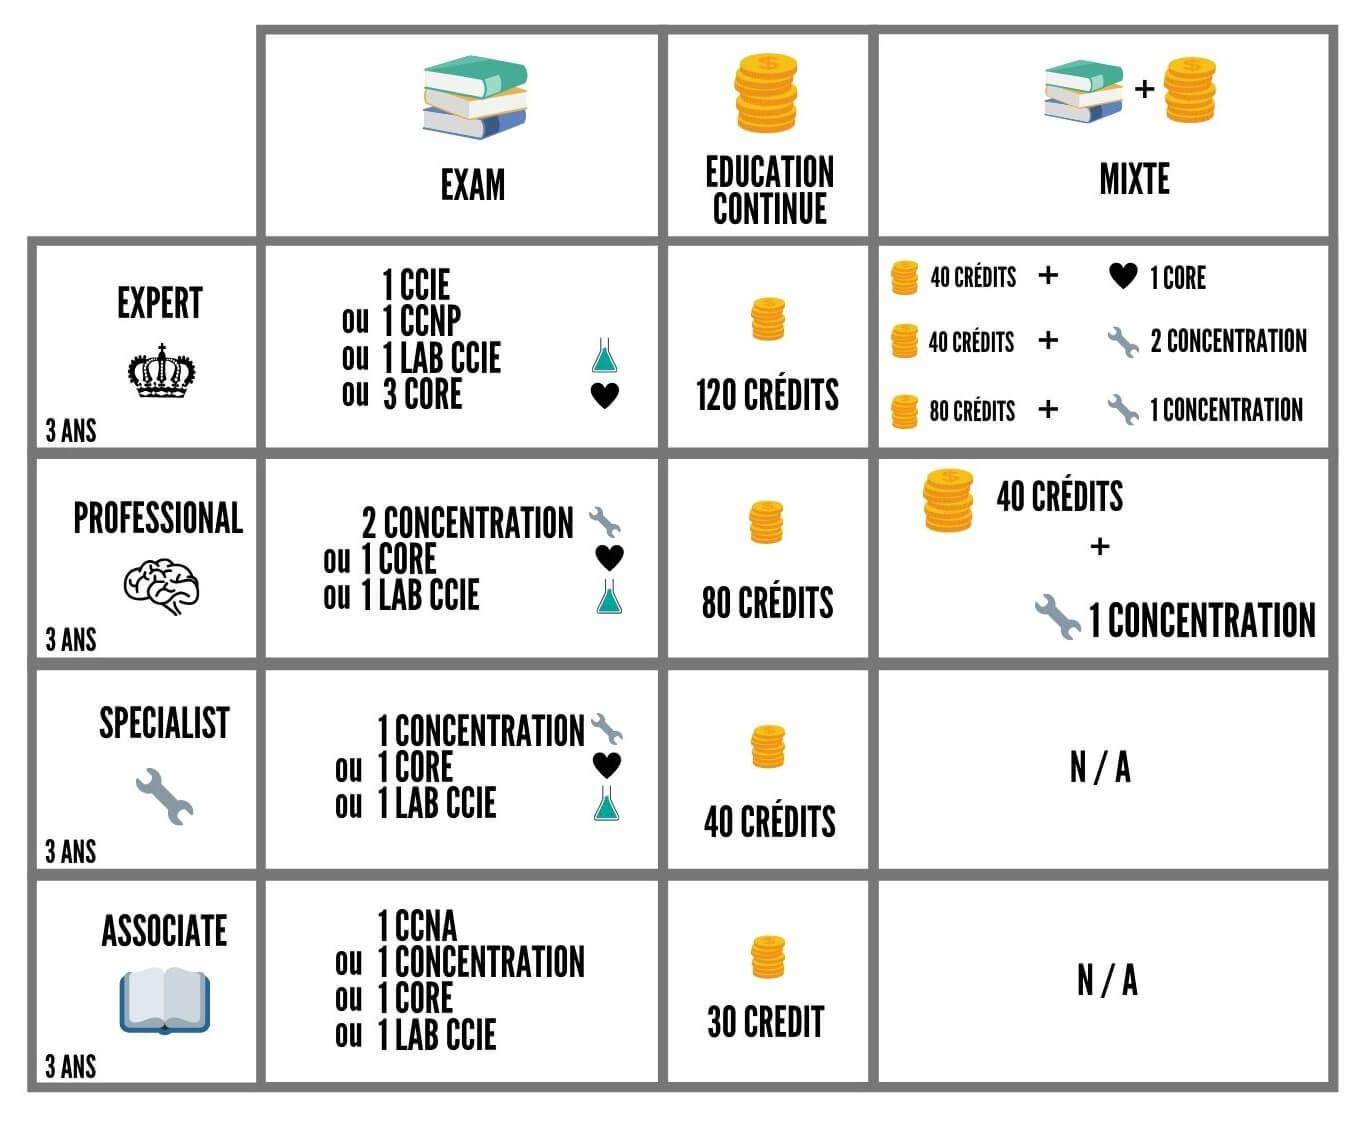 Les certifications CISCO v3 4